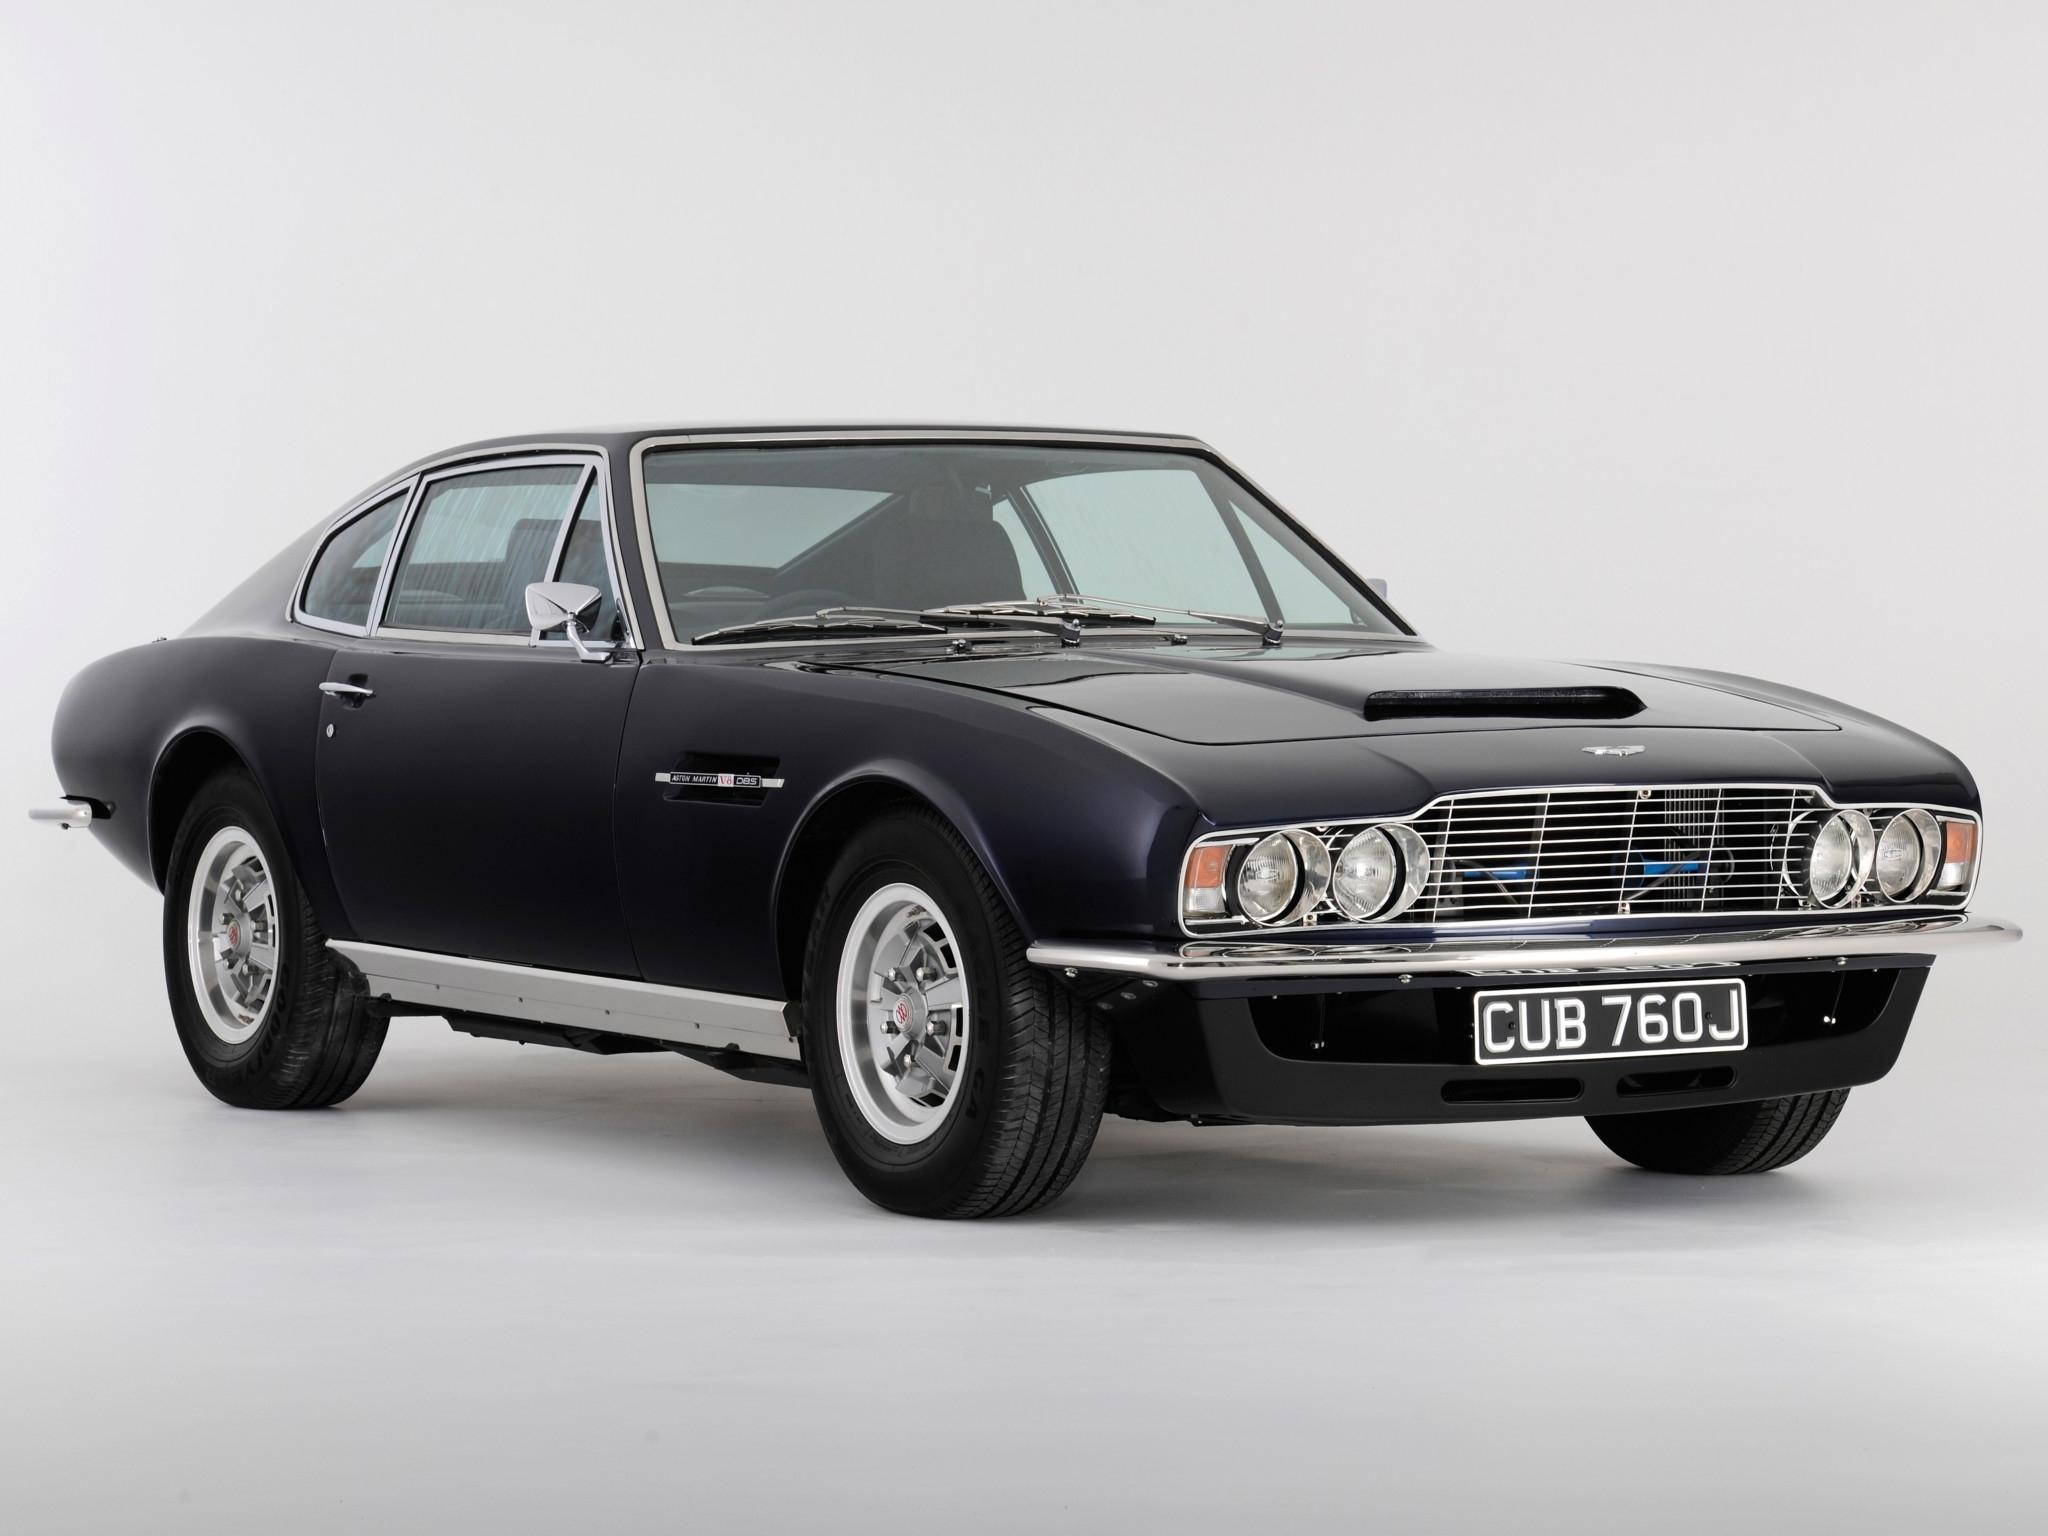 Aston Martin Dbs Buying Guide 1967 1973